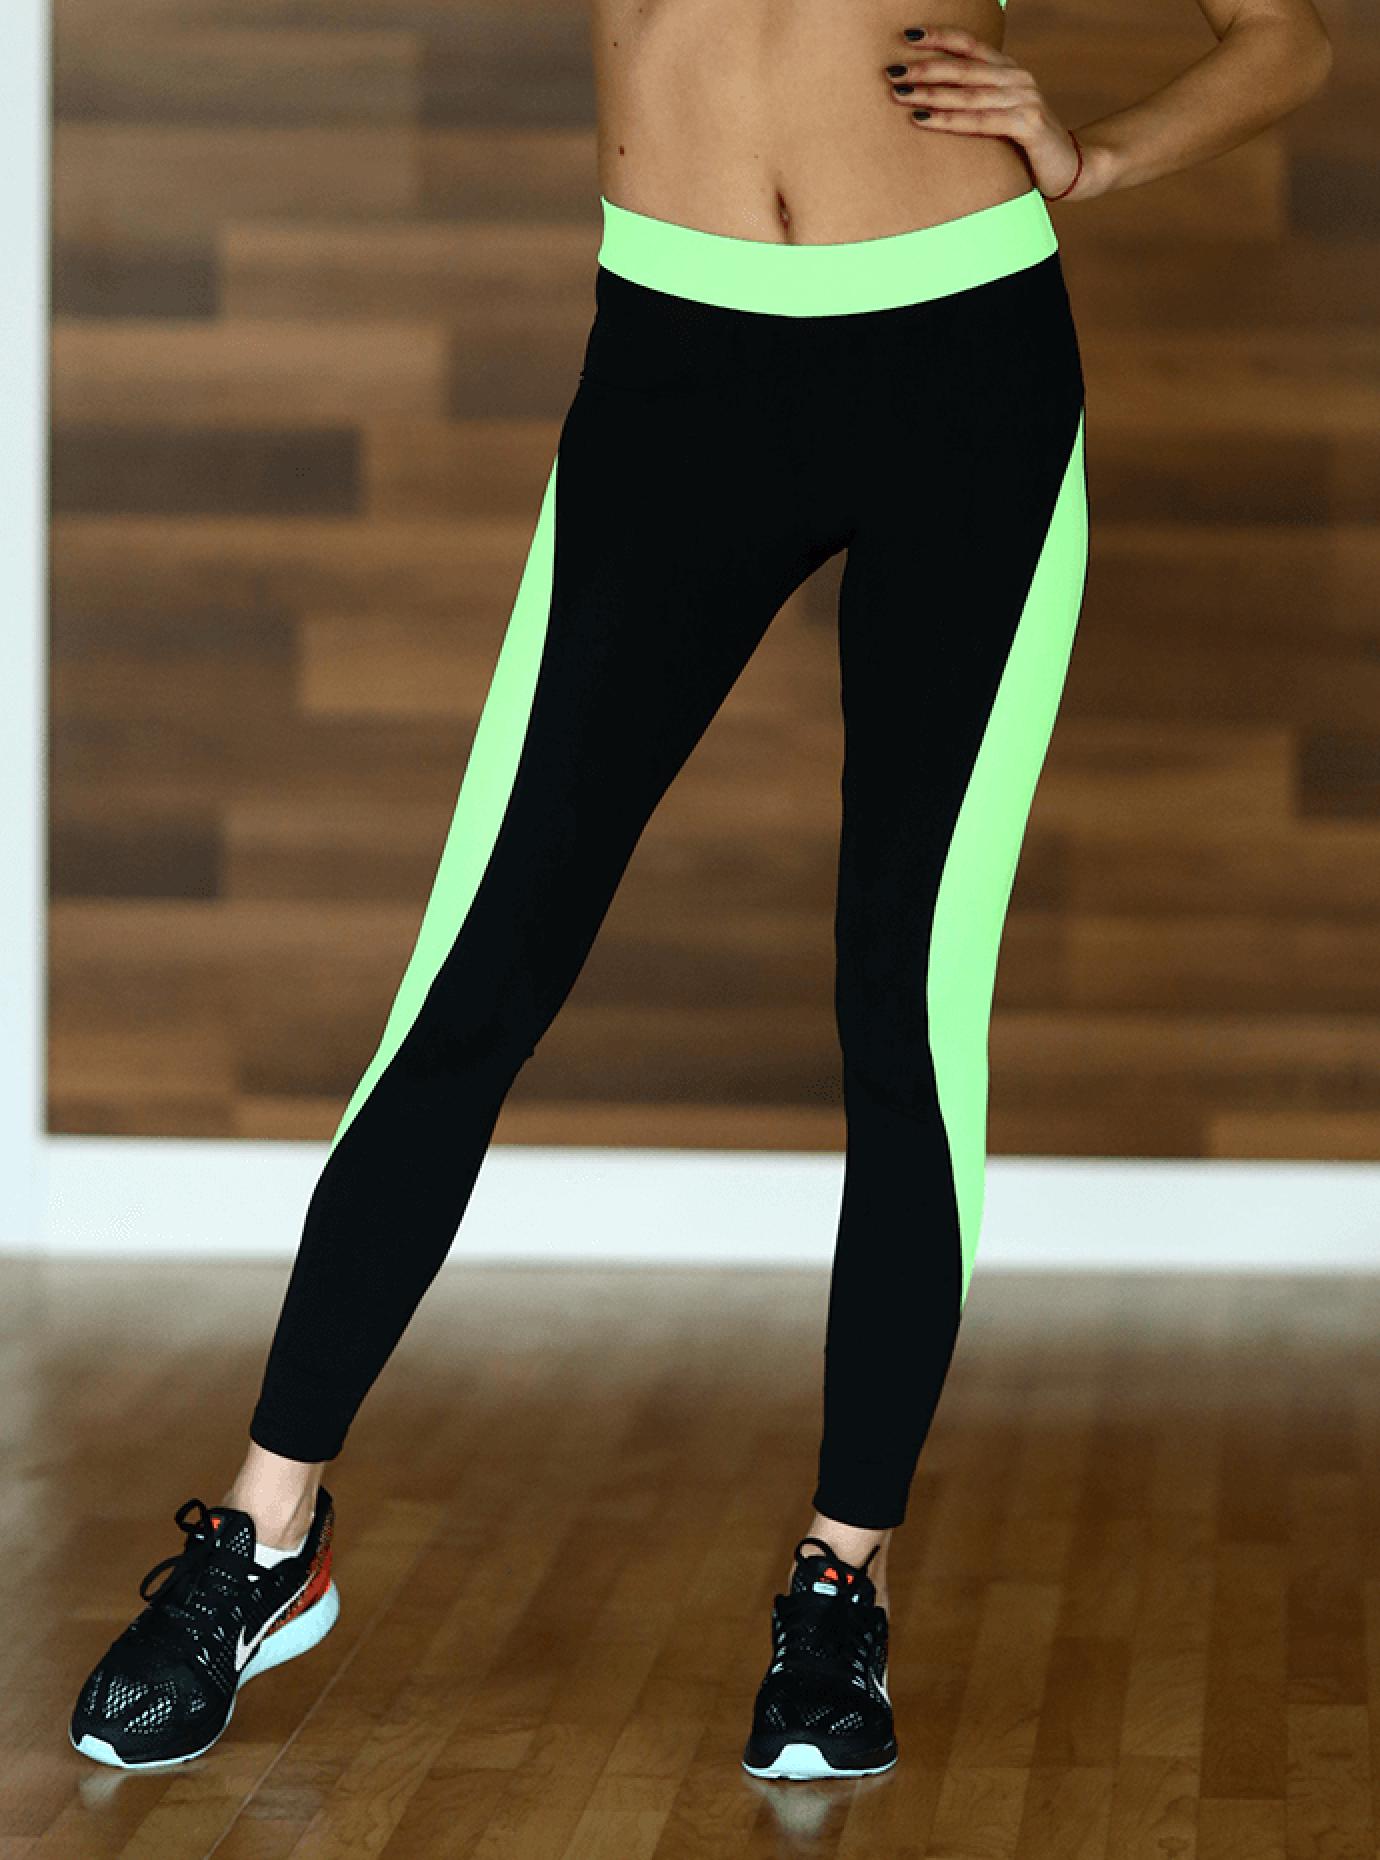 Леггинсы женские Basic Green Серый S (01-F171003): фото - Alster.ua